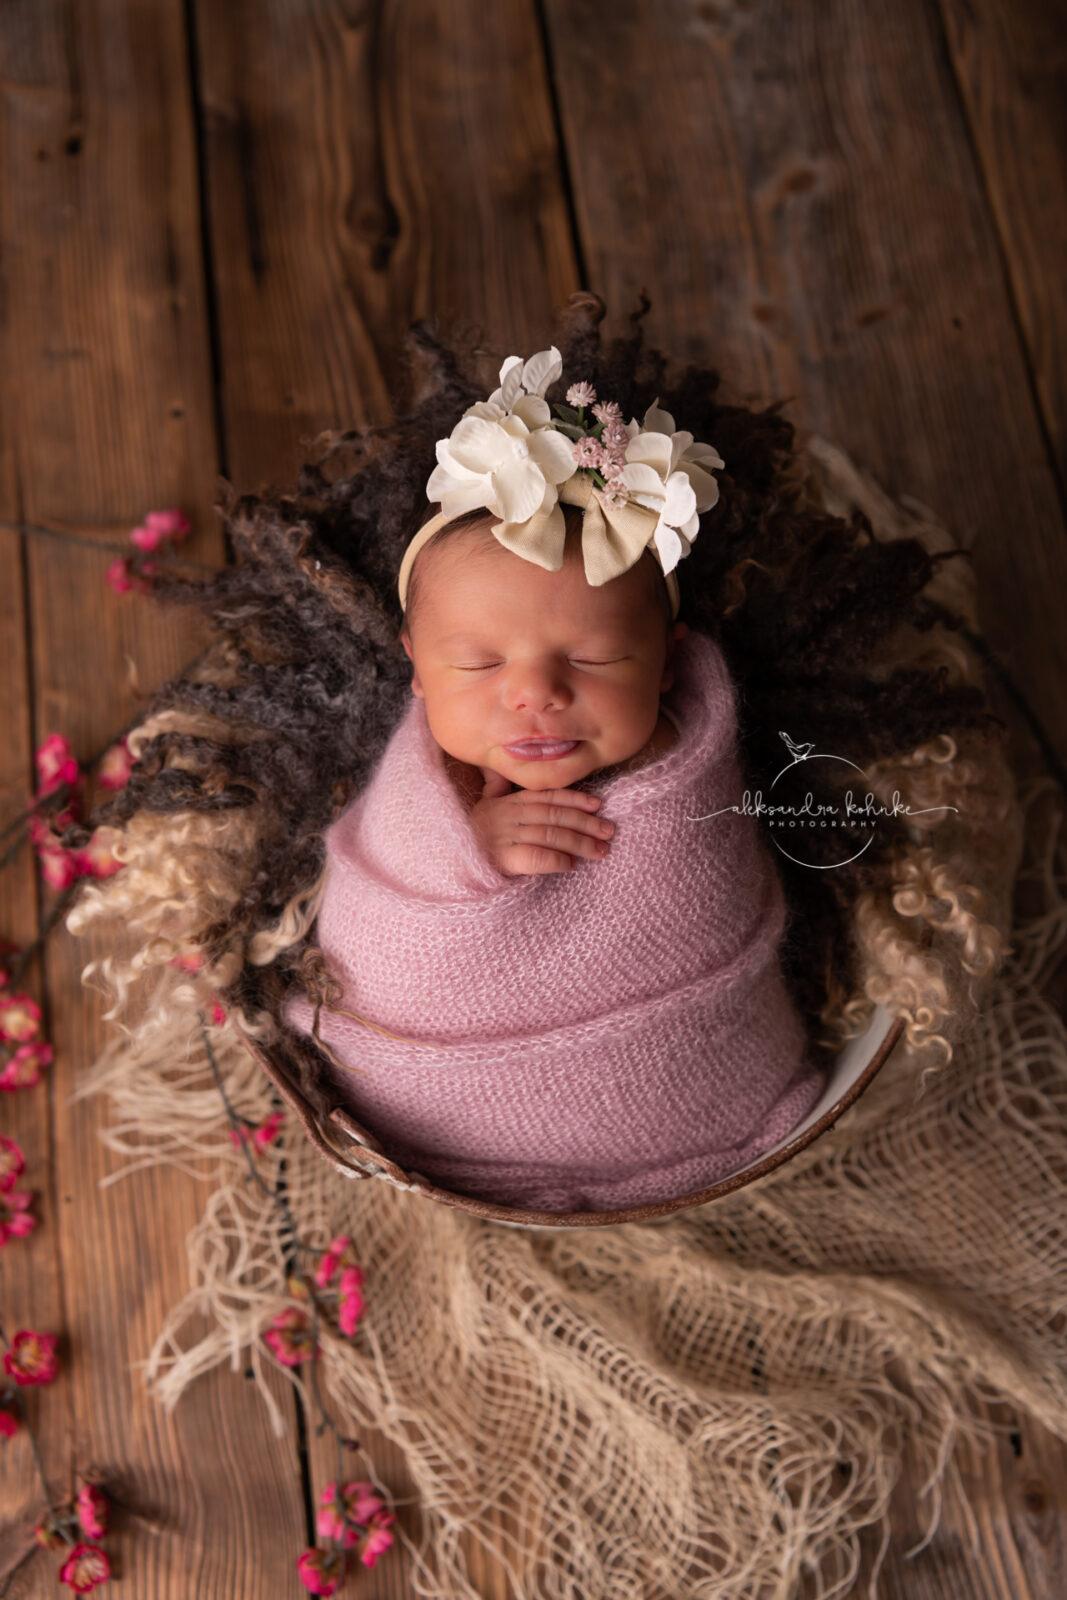 Süsse Neugeborenenbilder als Erinnerung bei Fotograf Aleksandra Kohnke